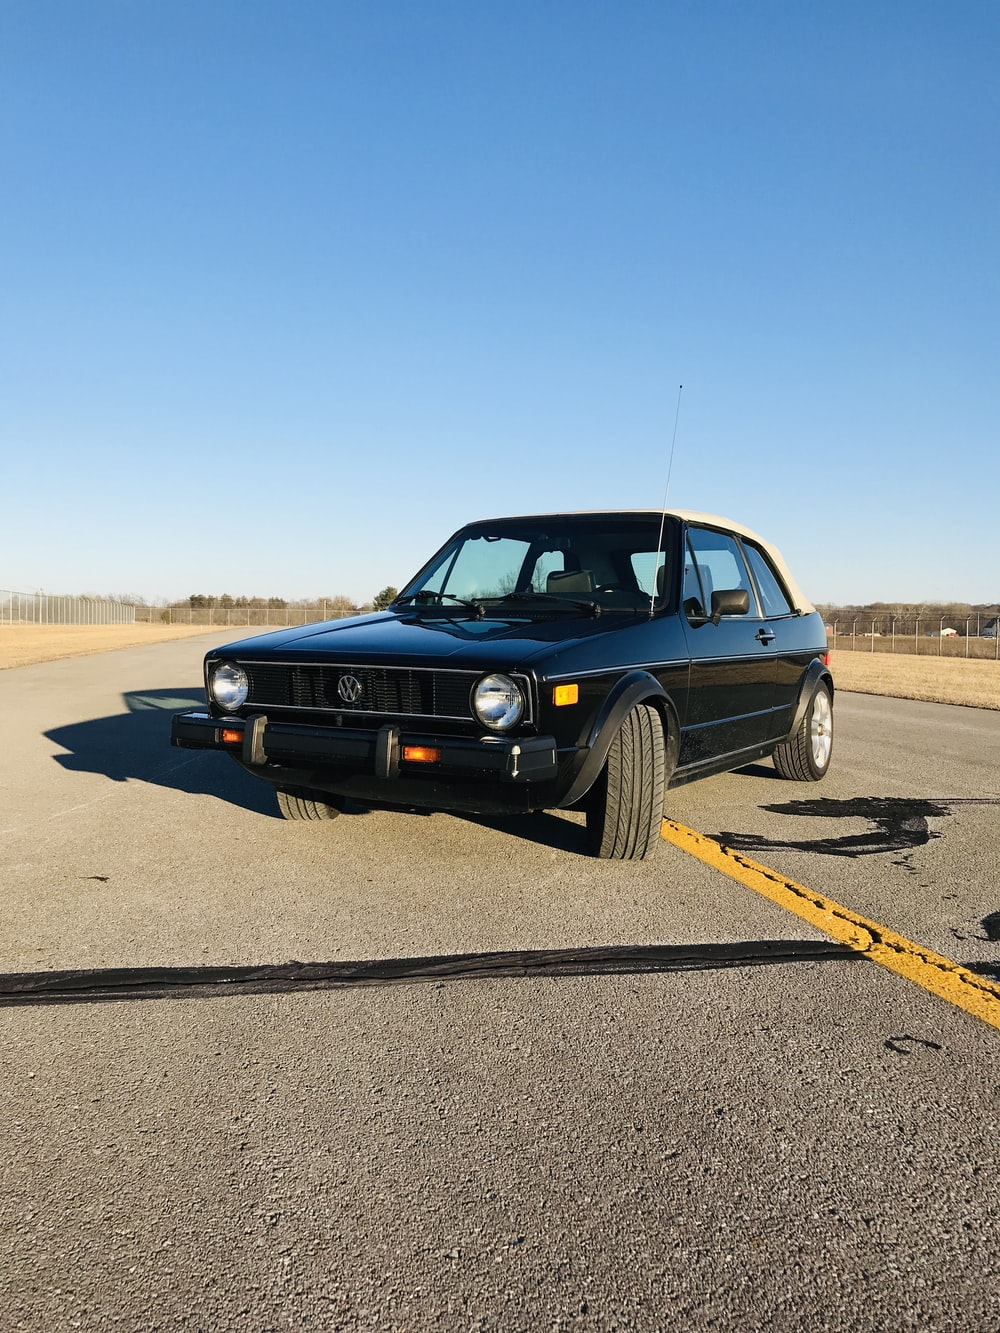 black chevrolet camaro on road during daytime